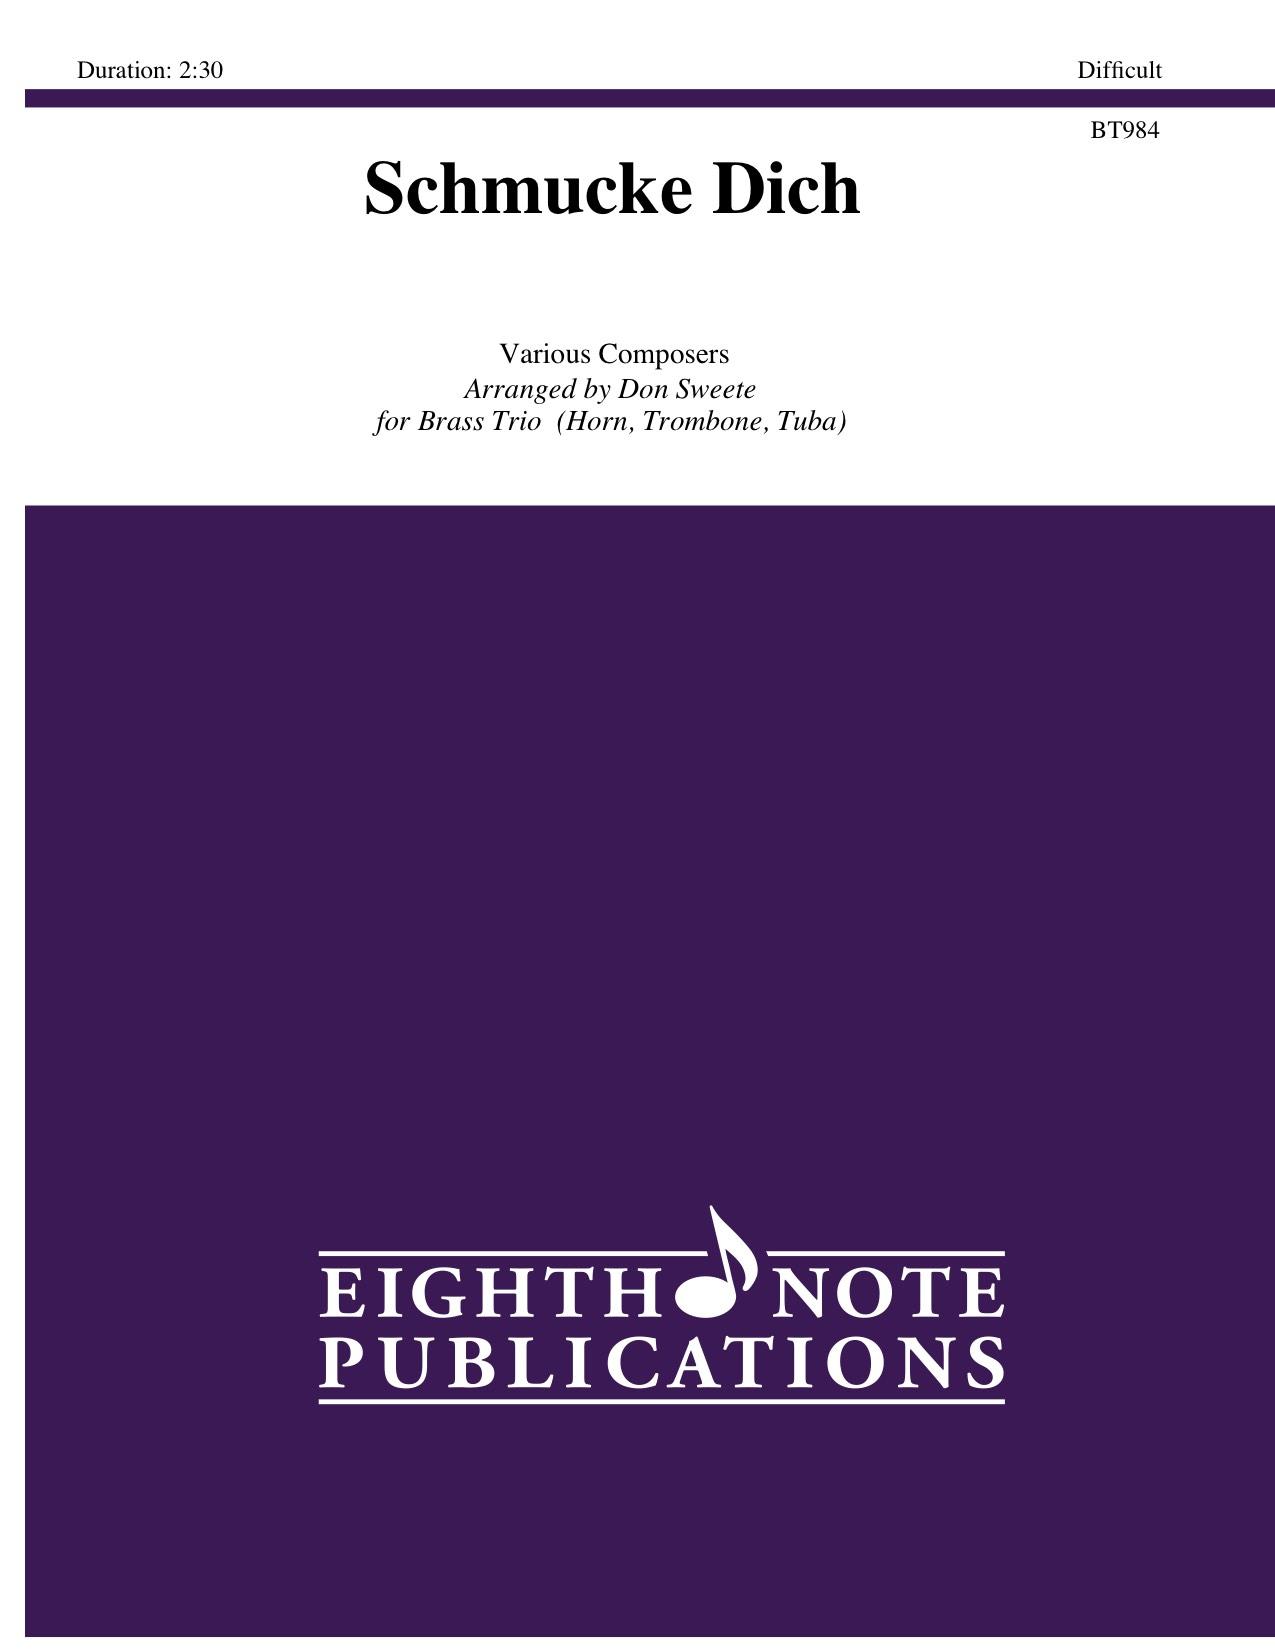 Schmucke Dich -  Various